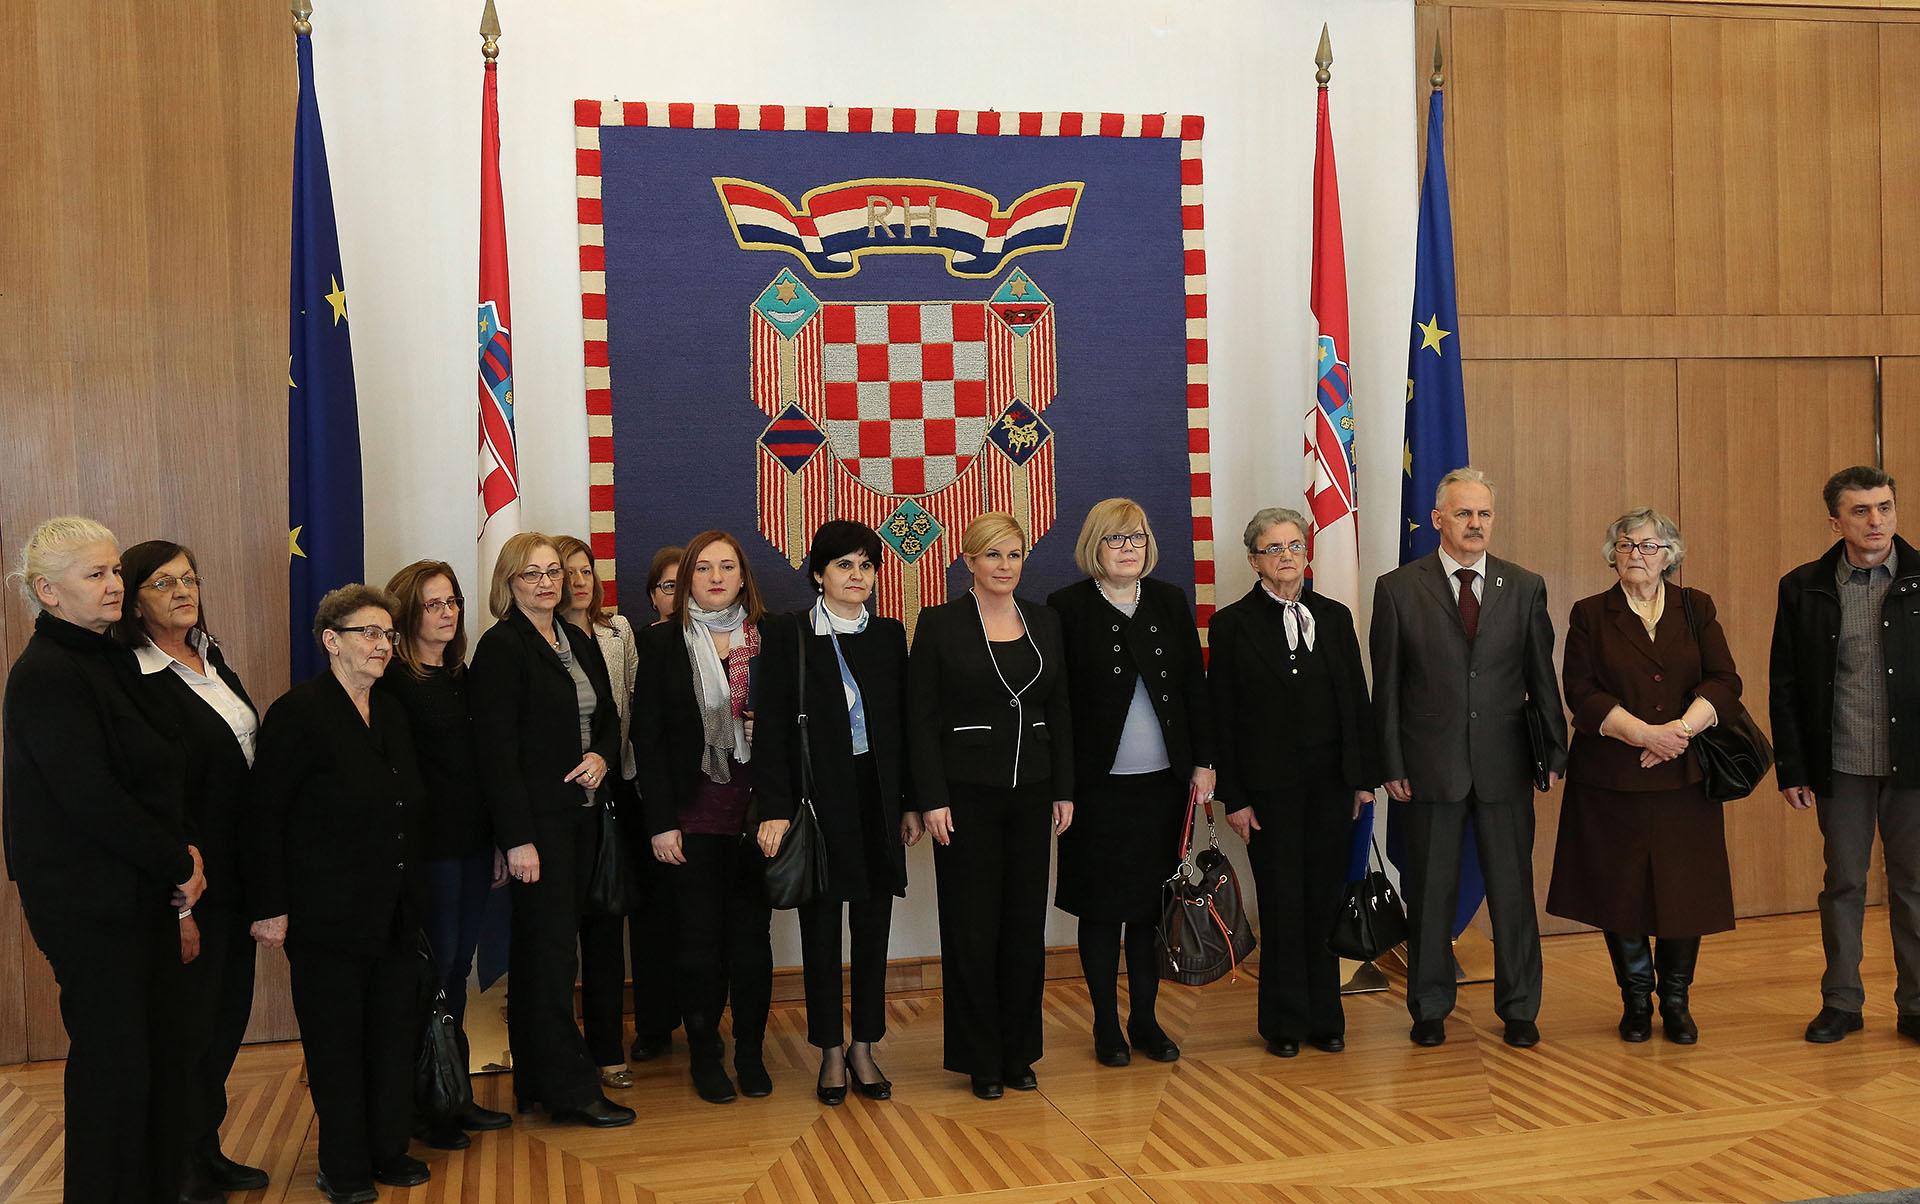 Predsjednica primila predstavnike srbijanskih udruga nestalih